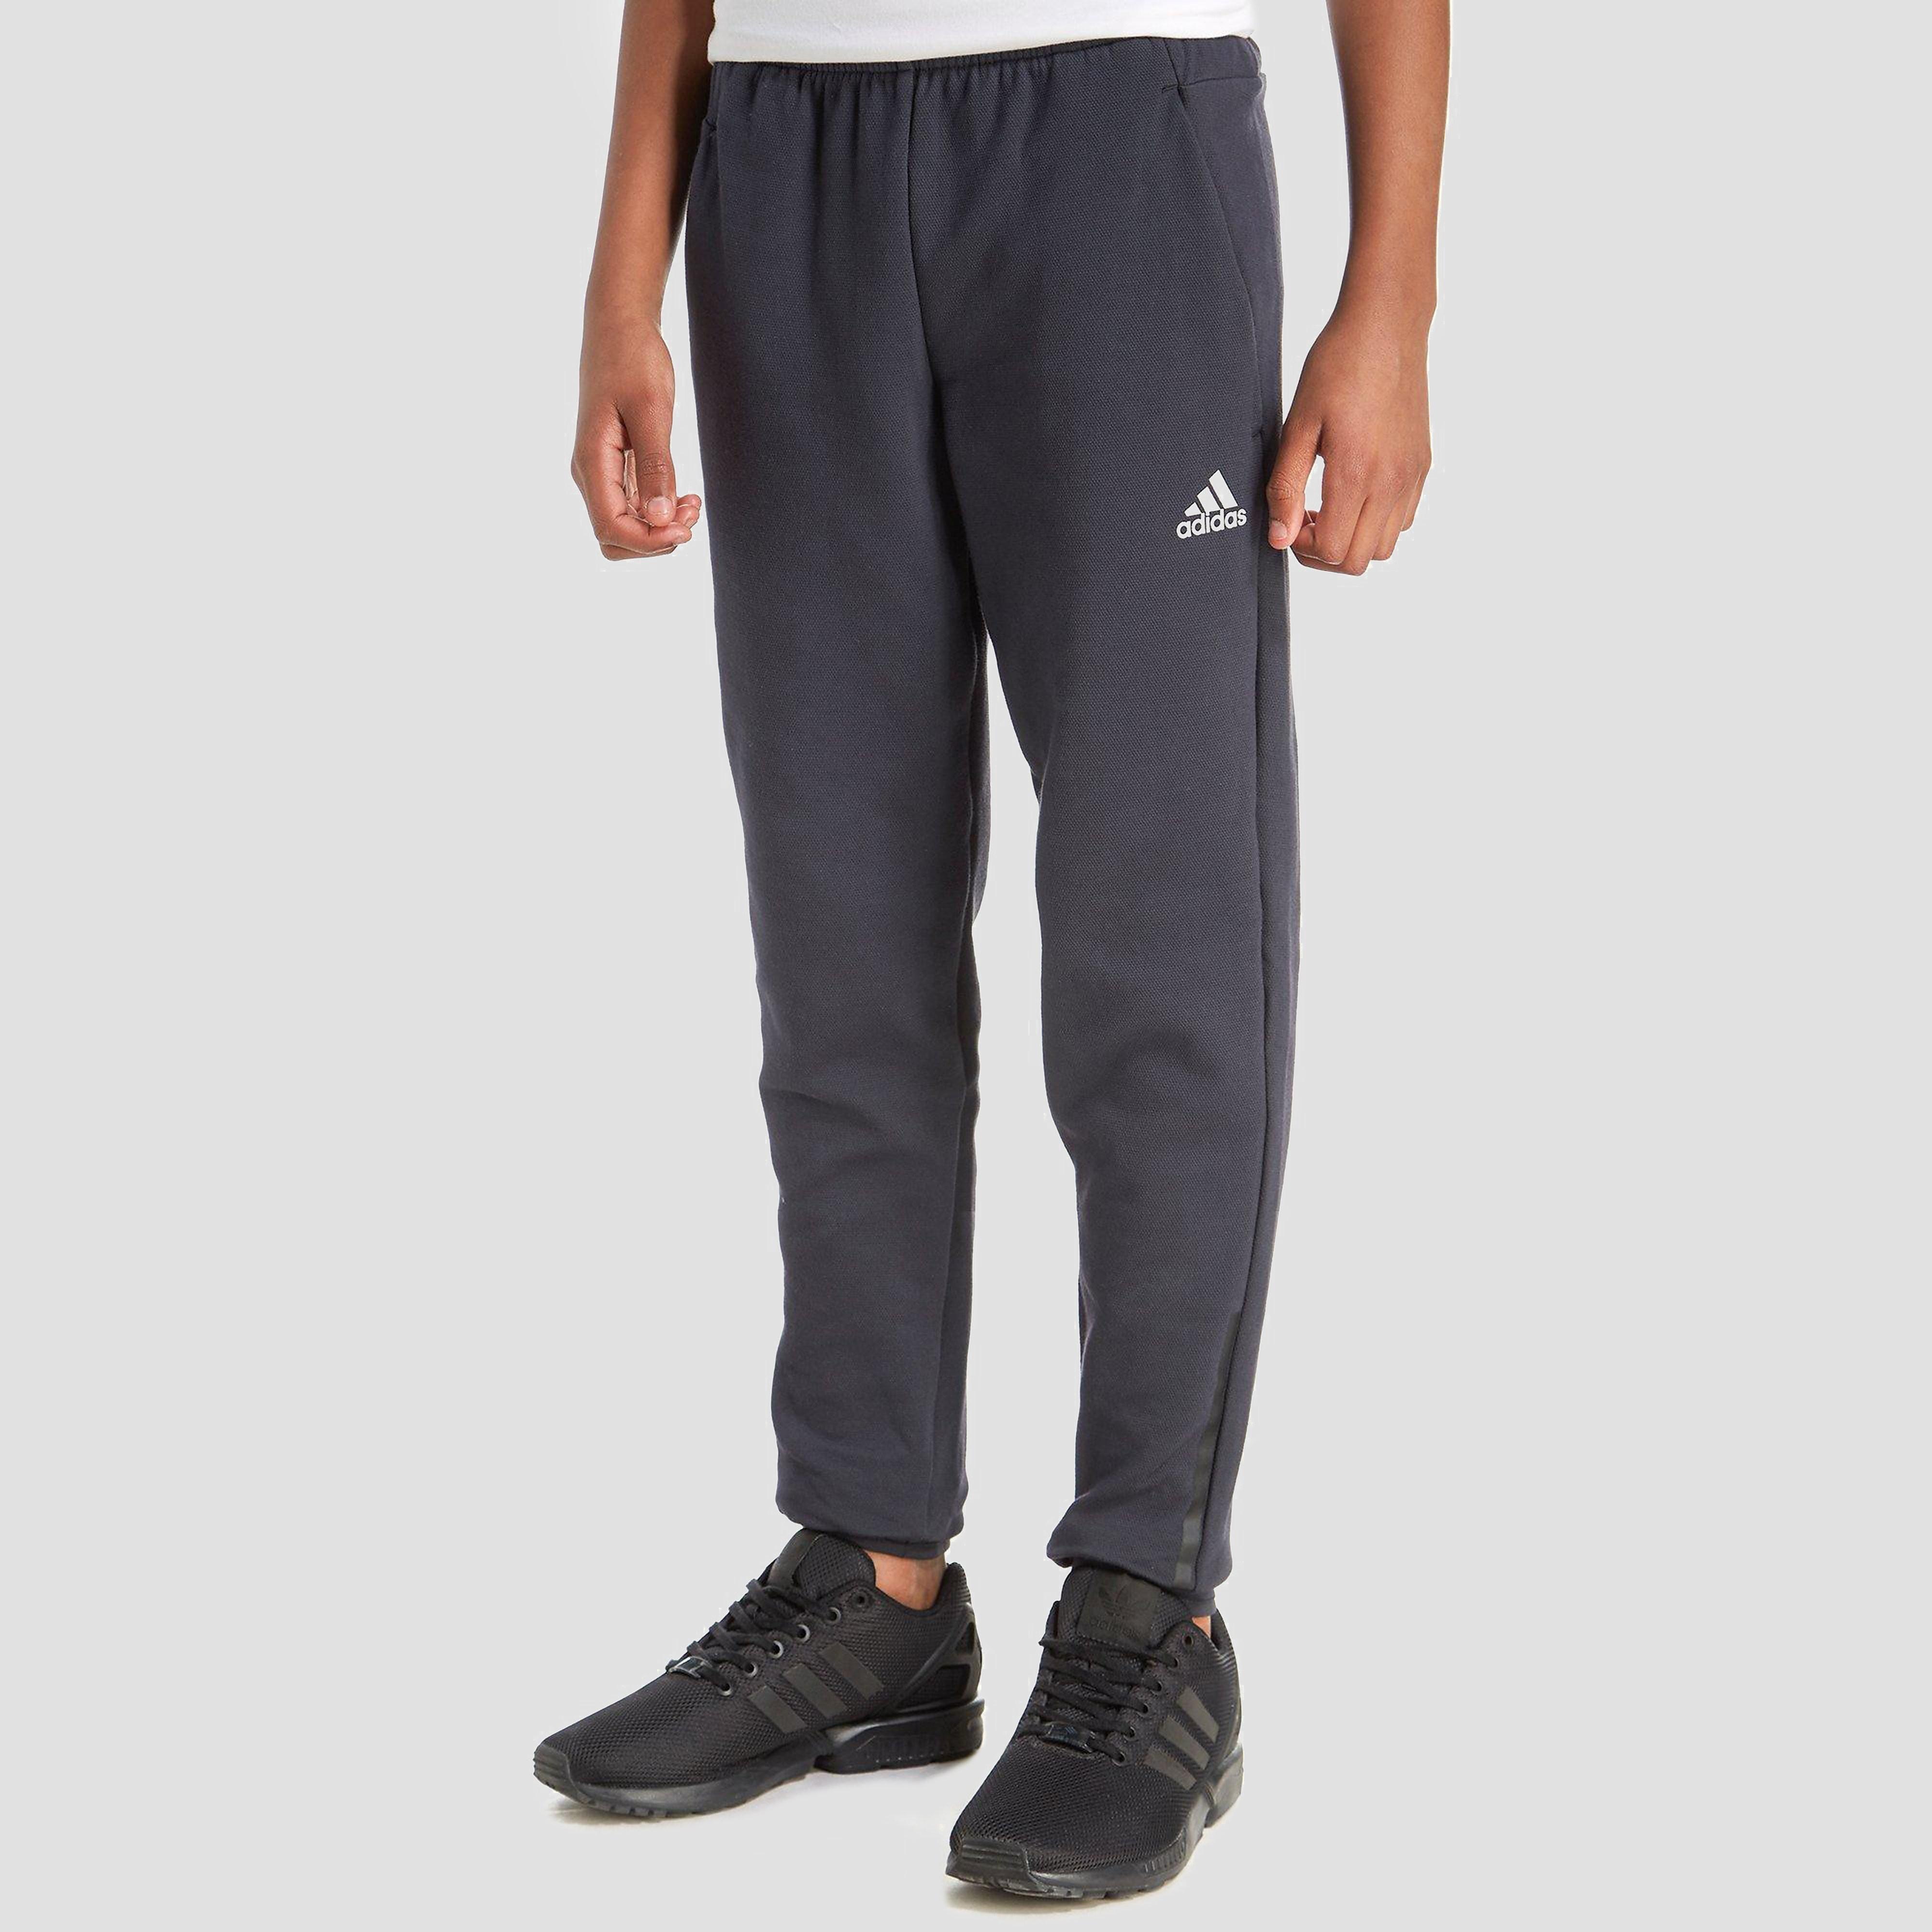 adidas Z.N.E Junior Pants